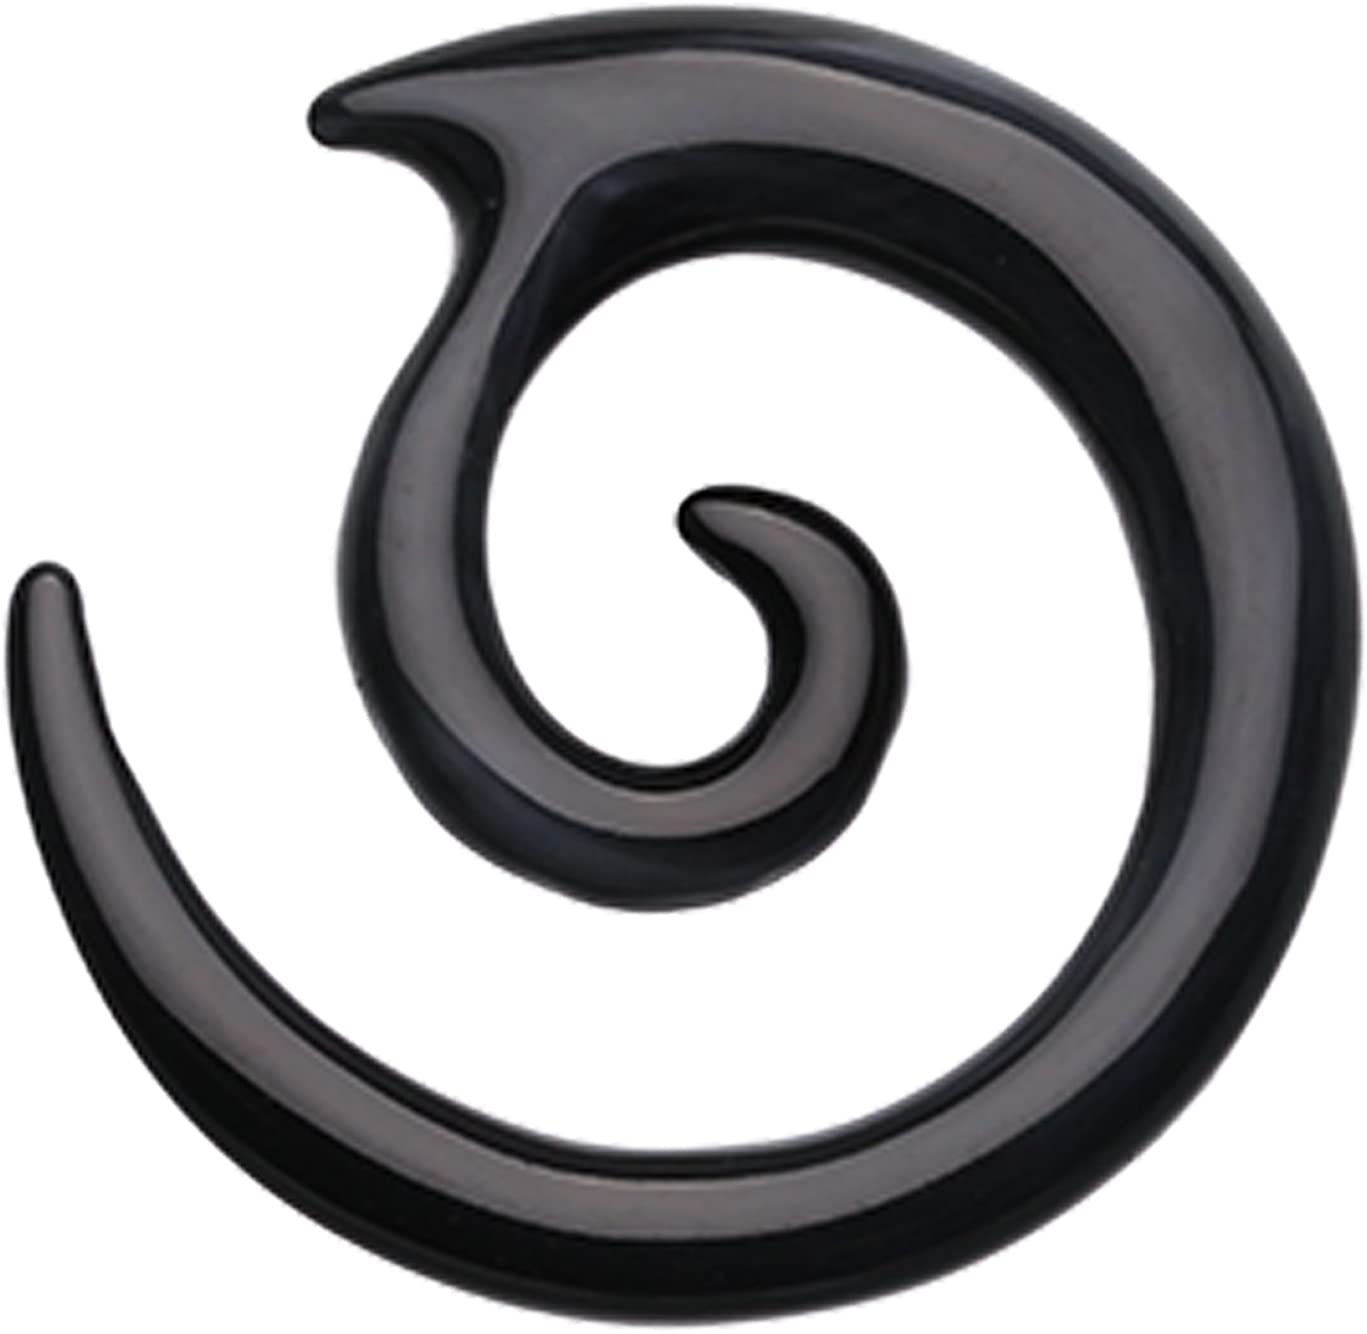 Heartbreaker Acrylic Ear Gauge Hanging Taper Sold as a Pair Black